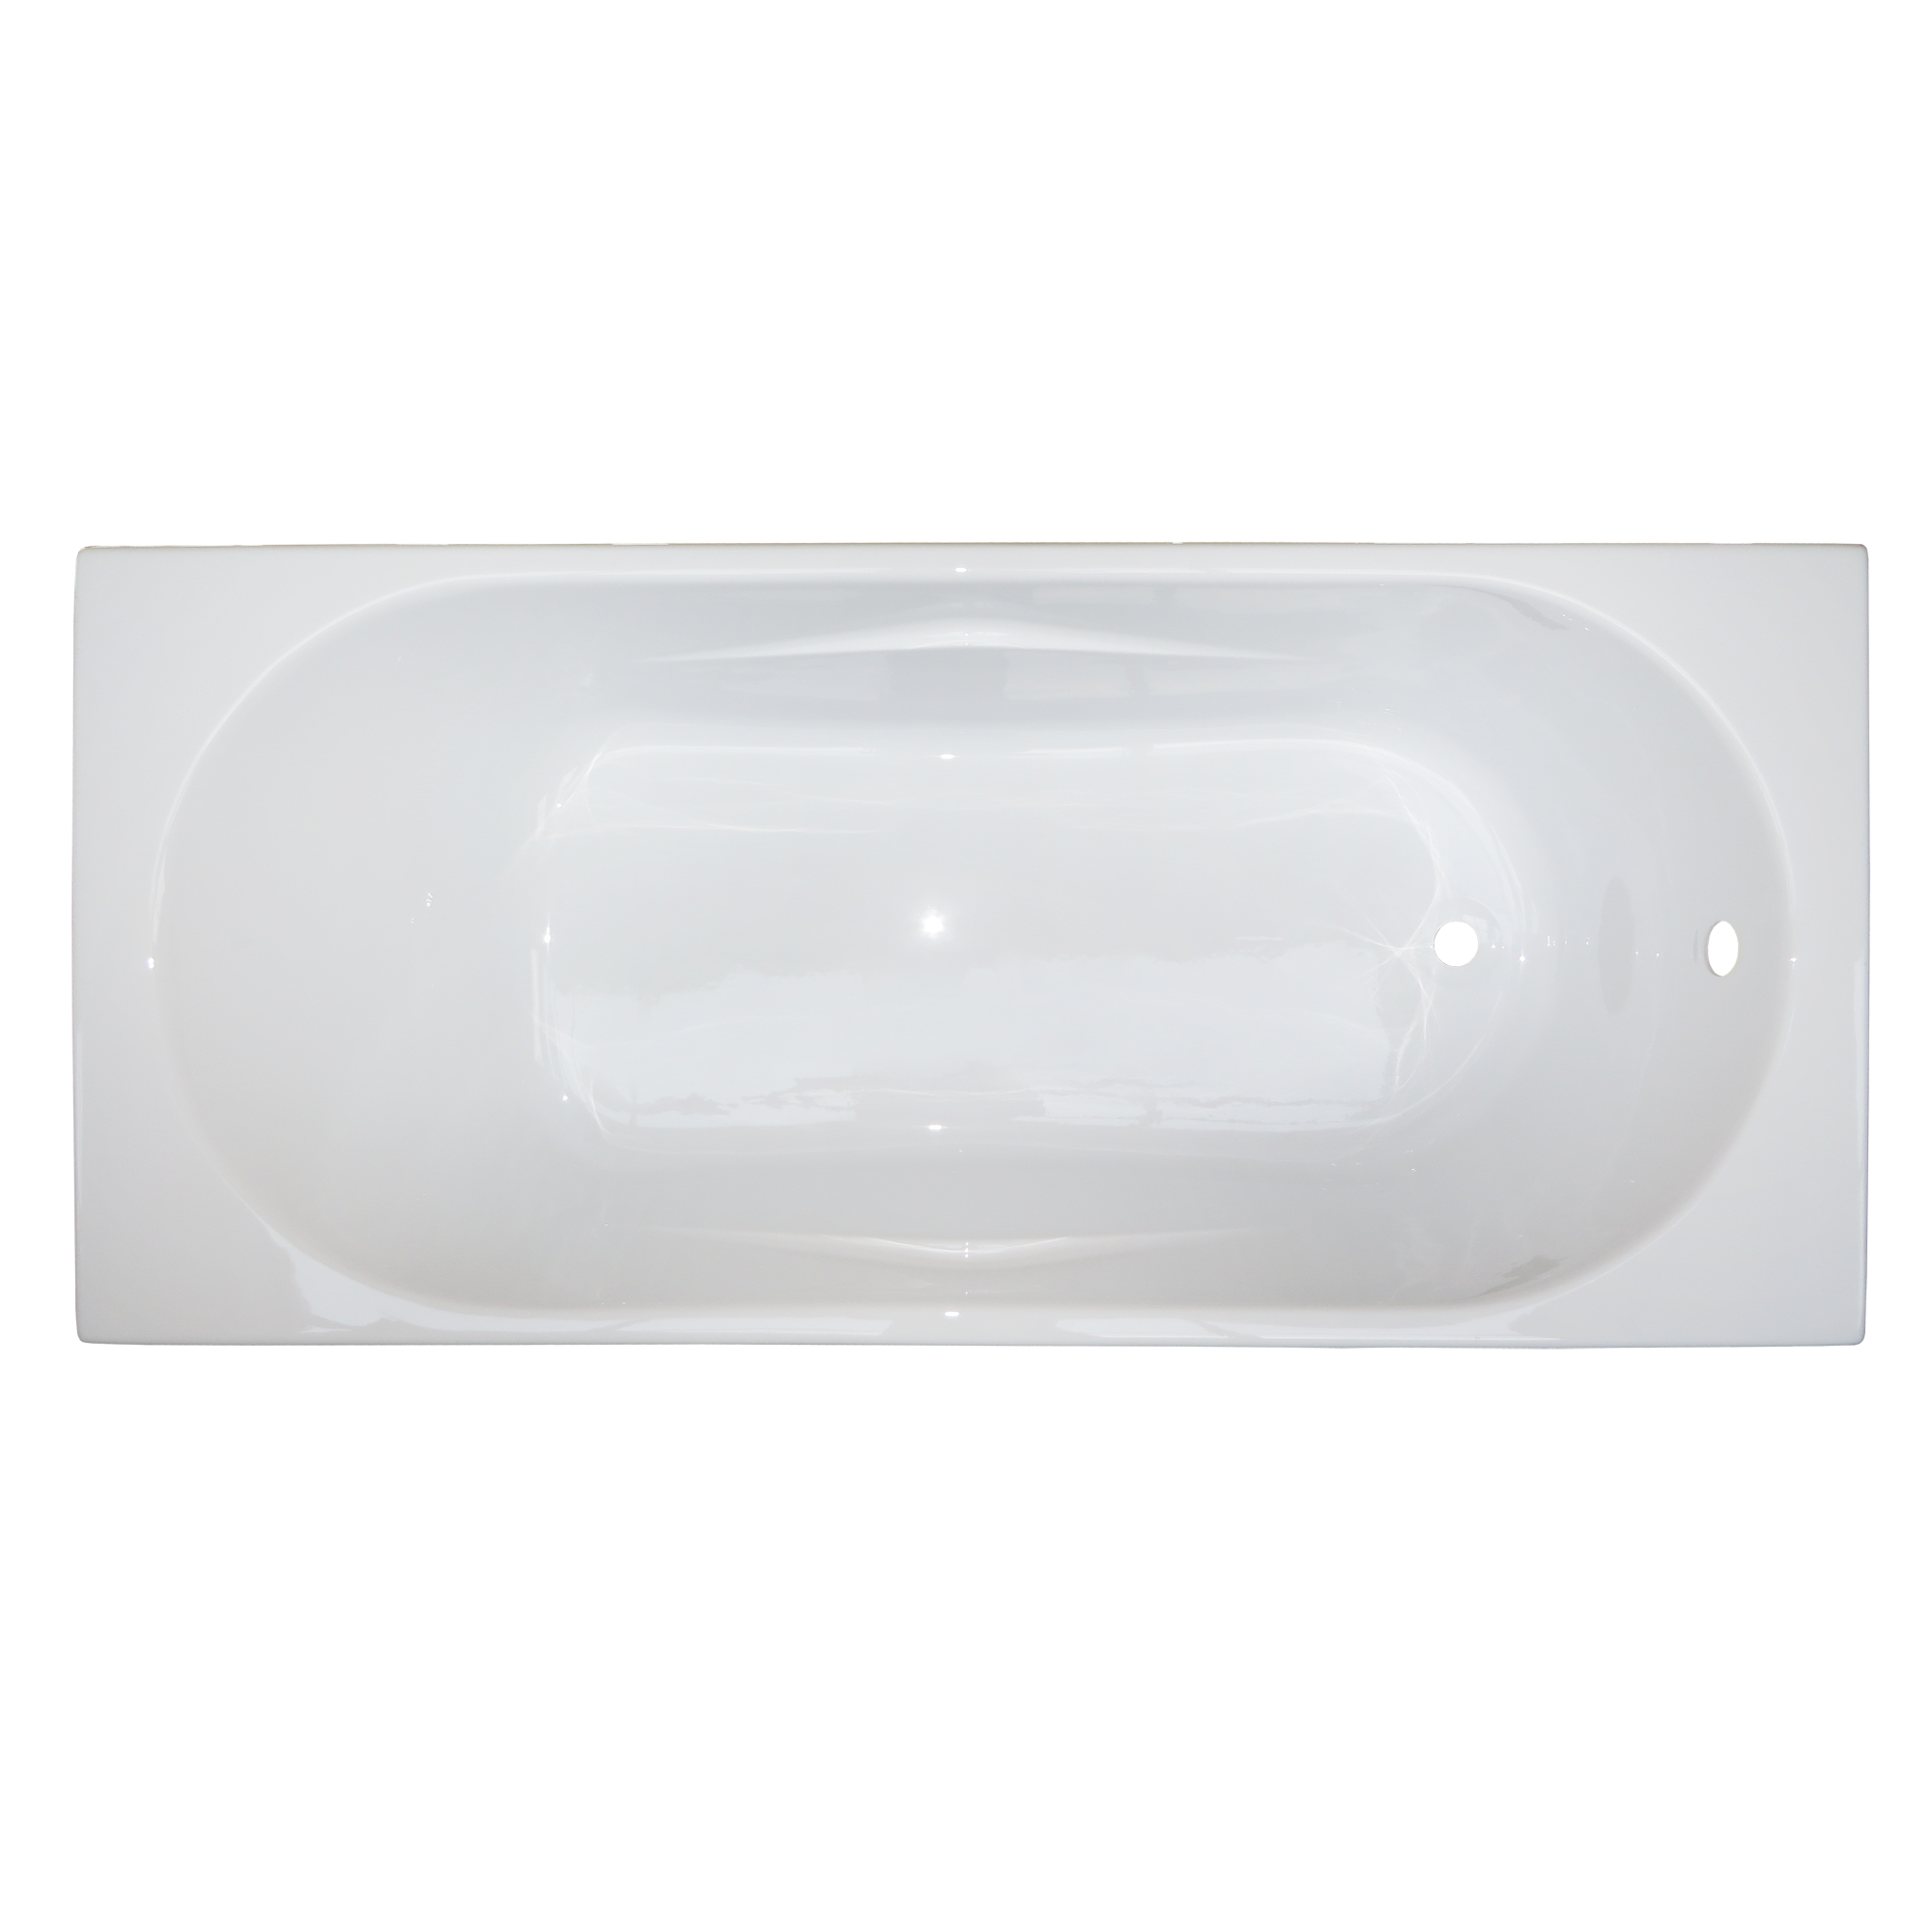 Акриловая ванна Royal bath Tudor RB407701 170х75 tudor аккумулятор tudor high tech 77ач обратная полярность ta770